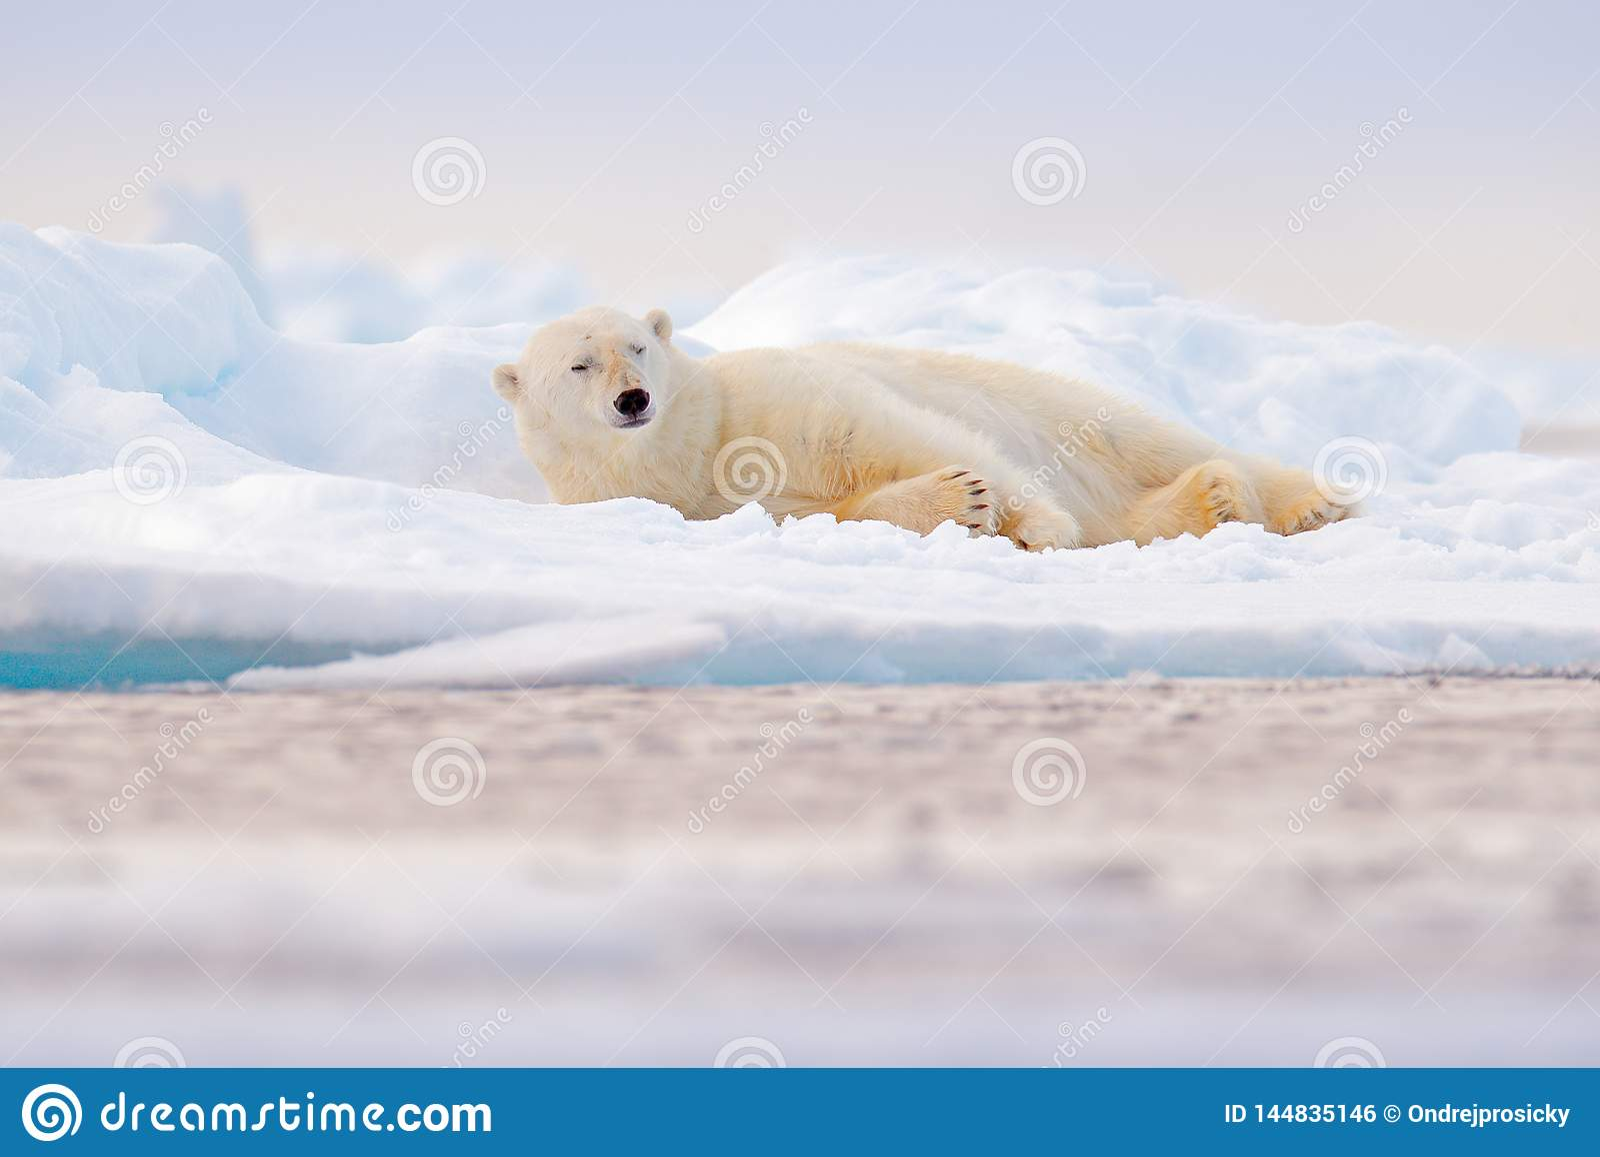 Urso polar na borda do gelo de tra??o com neve e na ?gua no mar de Noruega Animal branco no habitat da natureza, Svalbard, Europa